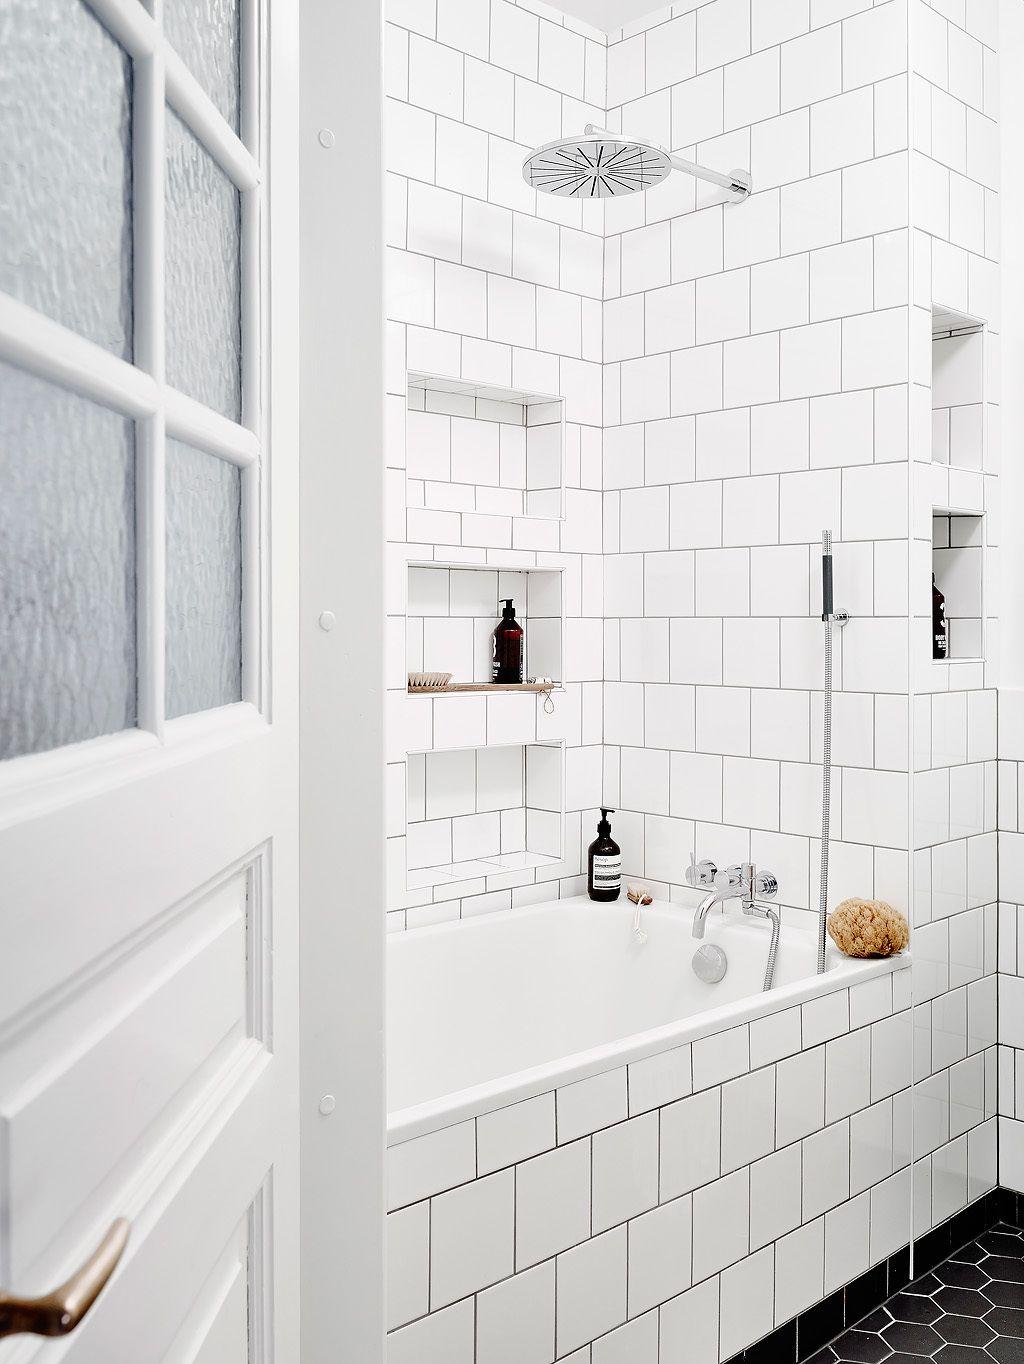 Bygg hyllnischer i badrummet! | Scandinavian interior design, Metro ...